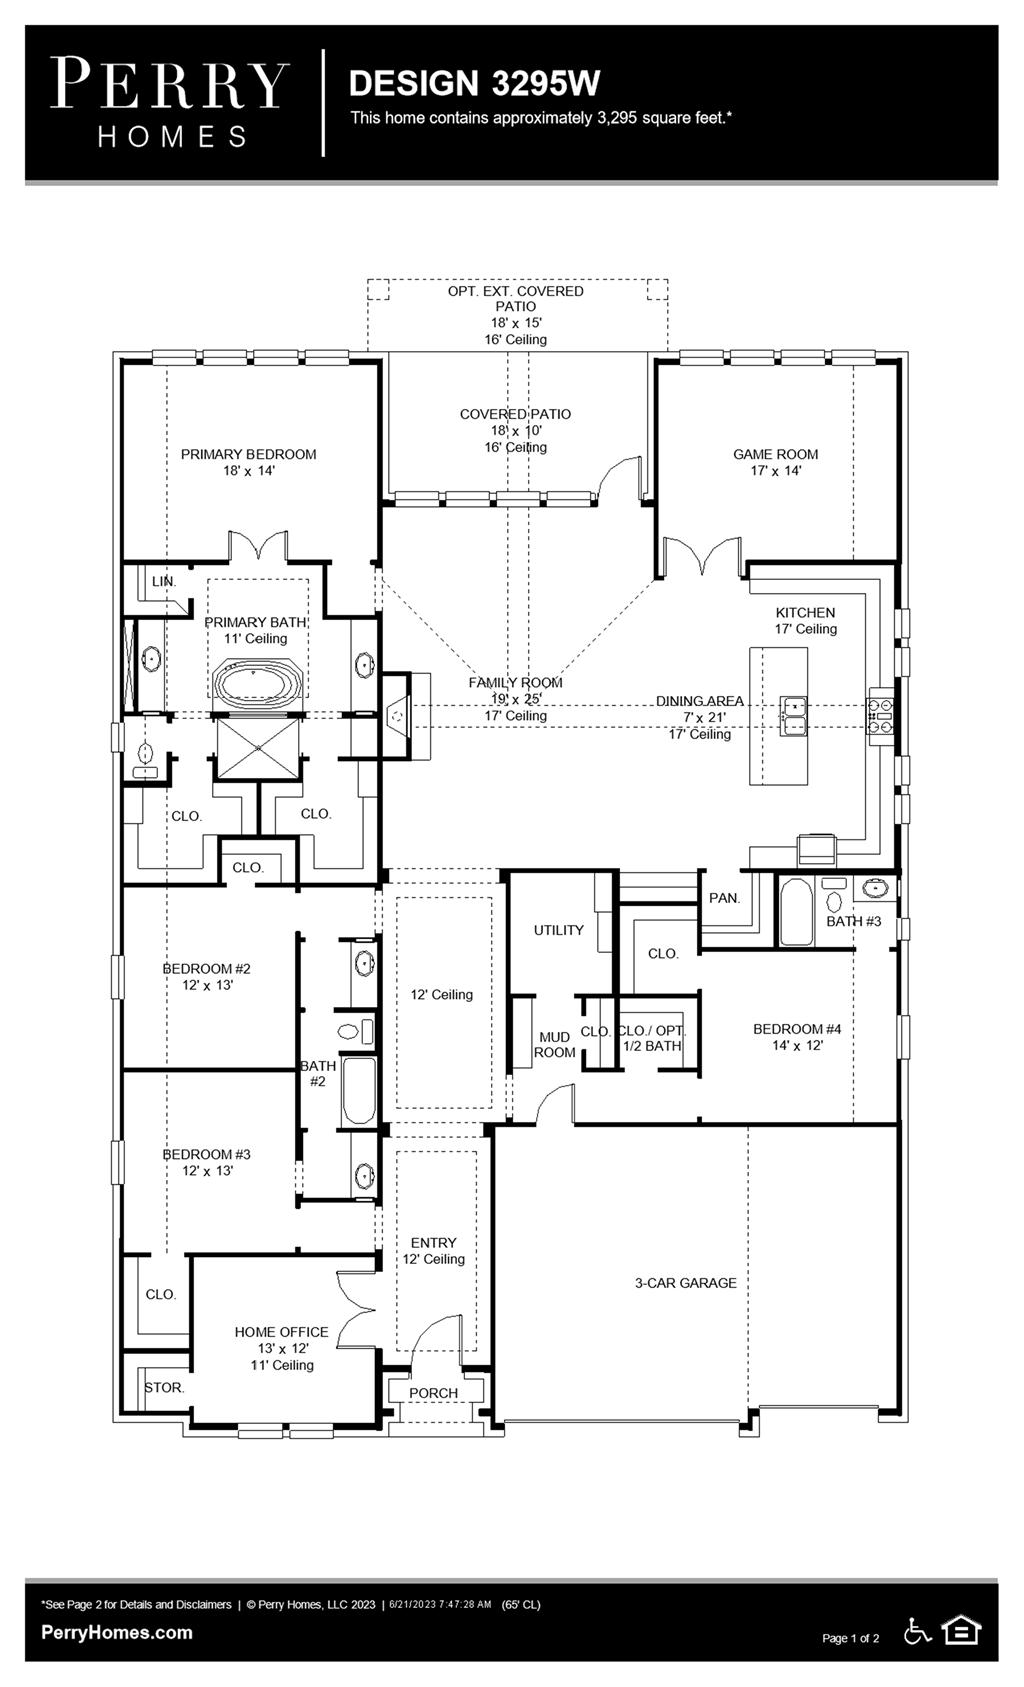 Floor Plan for 3295W